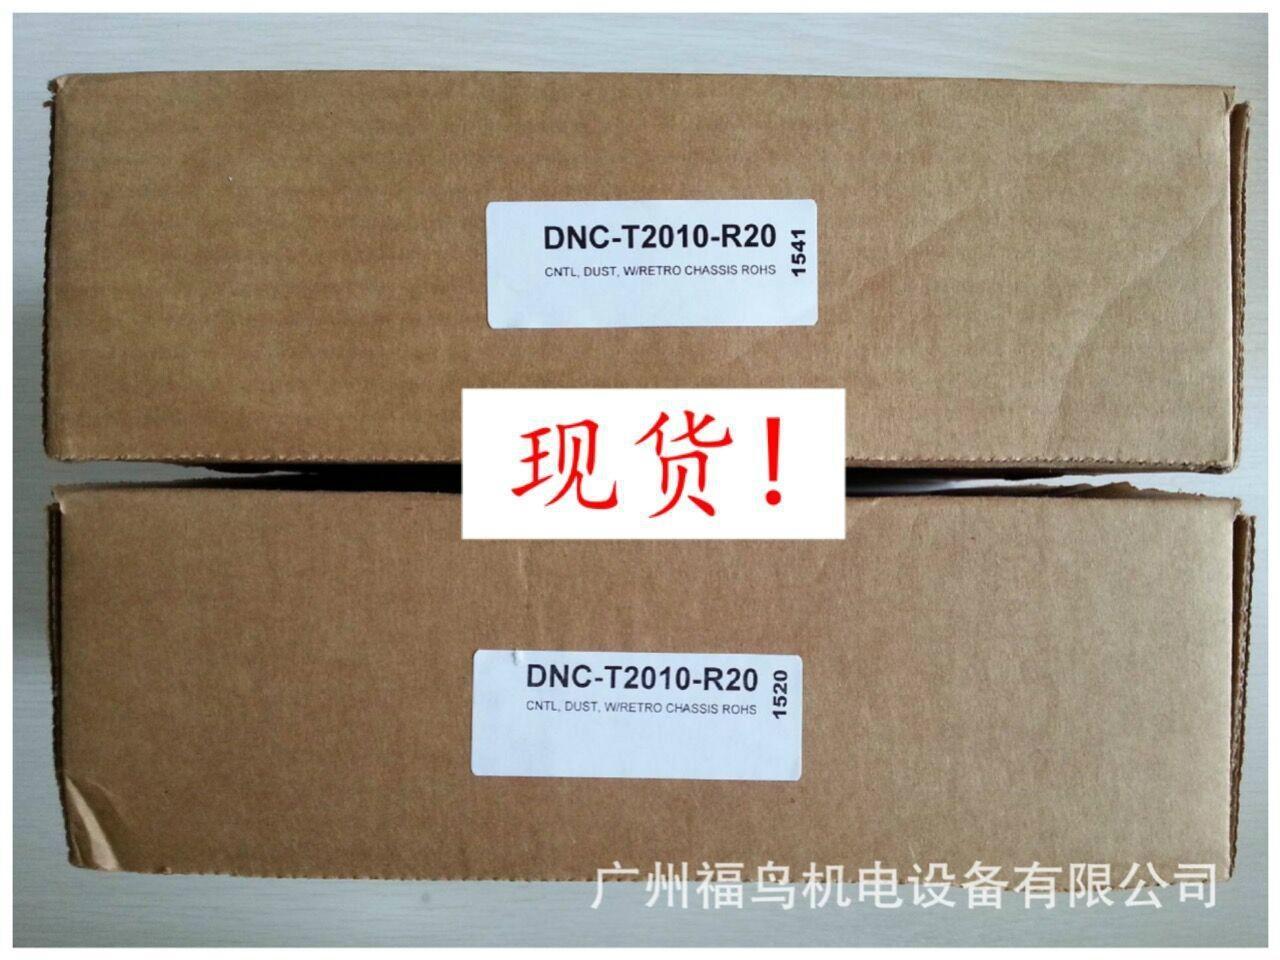 NCC时序控制板, 线路板, 型号: DNC-T2010-R20